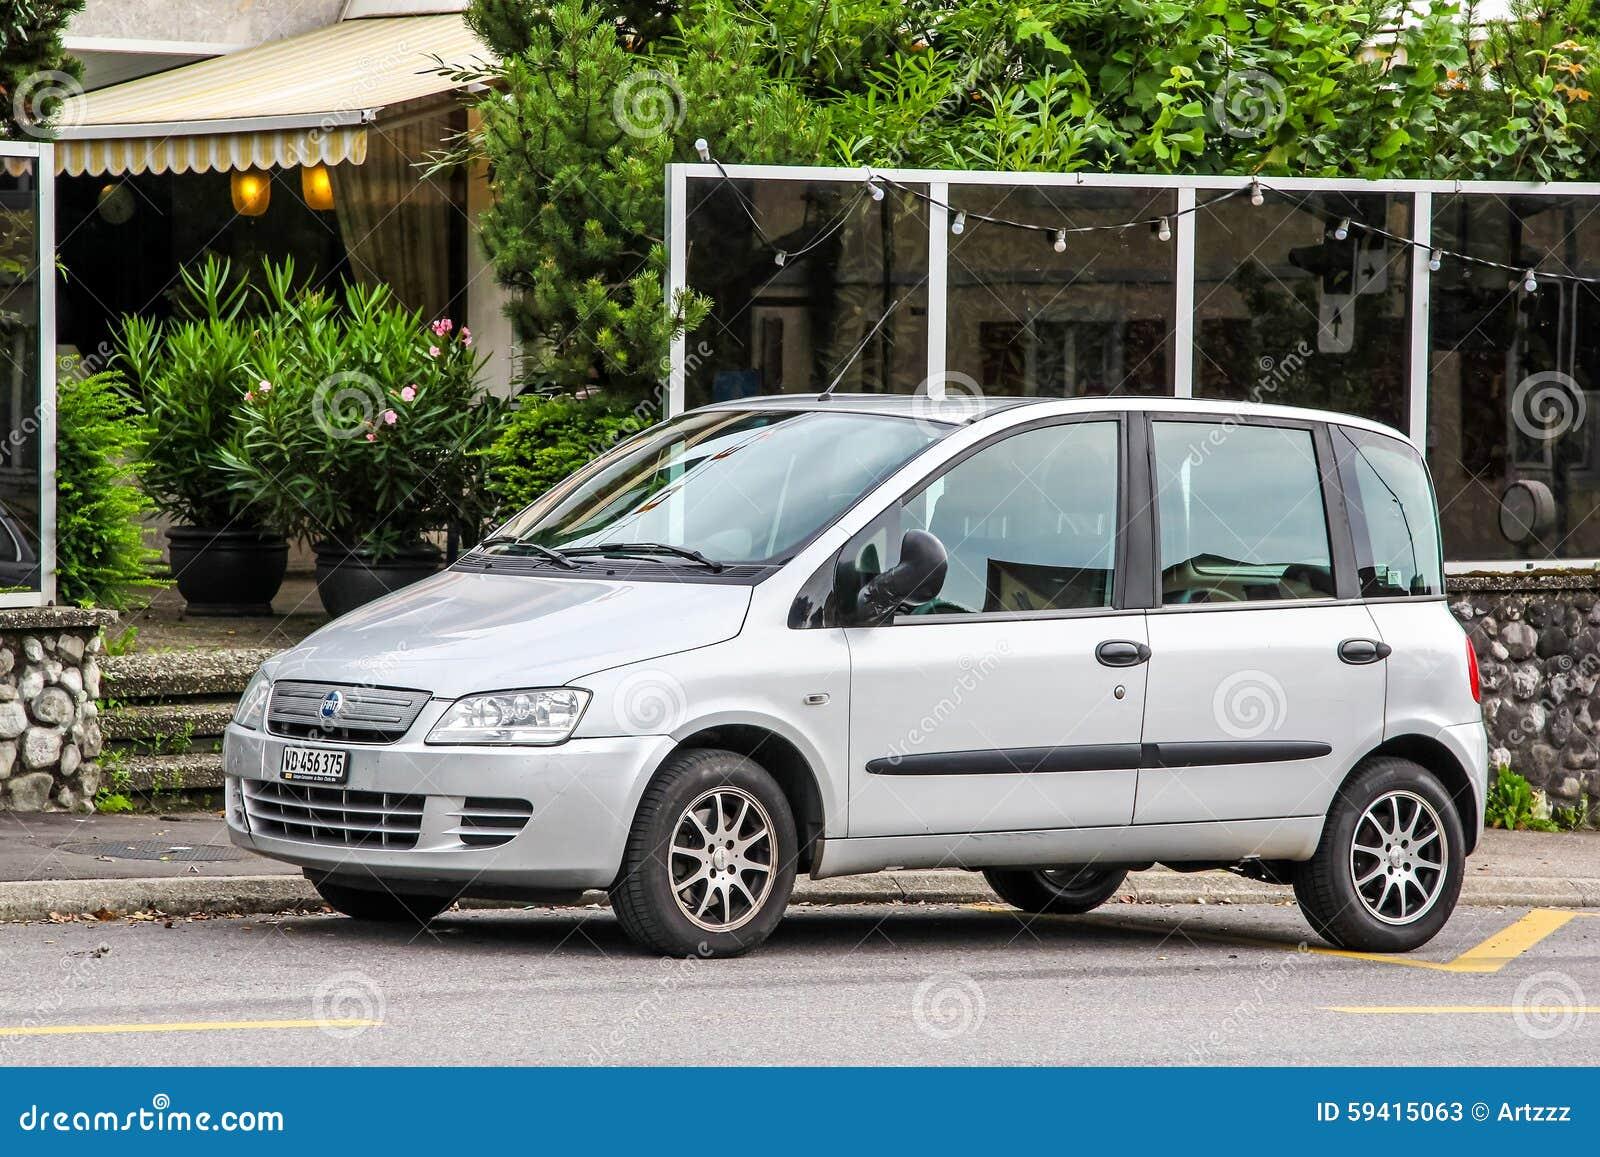 Fiat Multipla Editorial Stock Photo Image 59415063